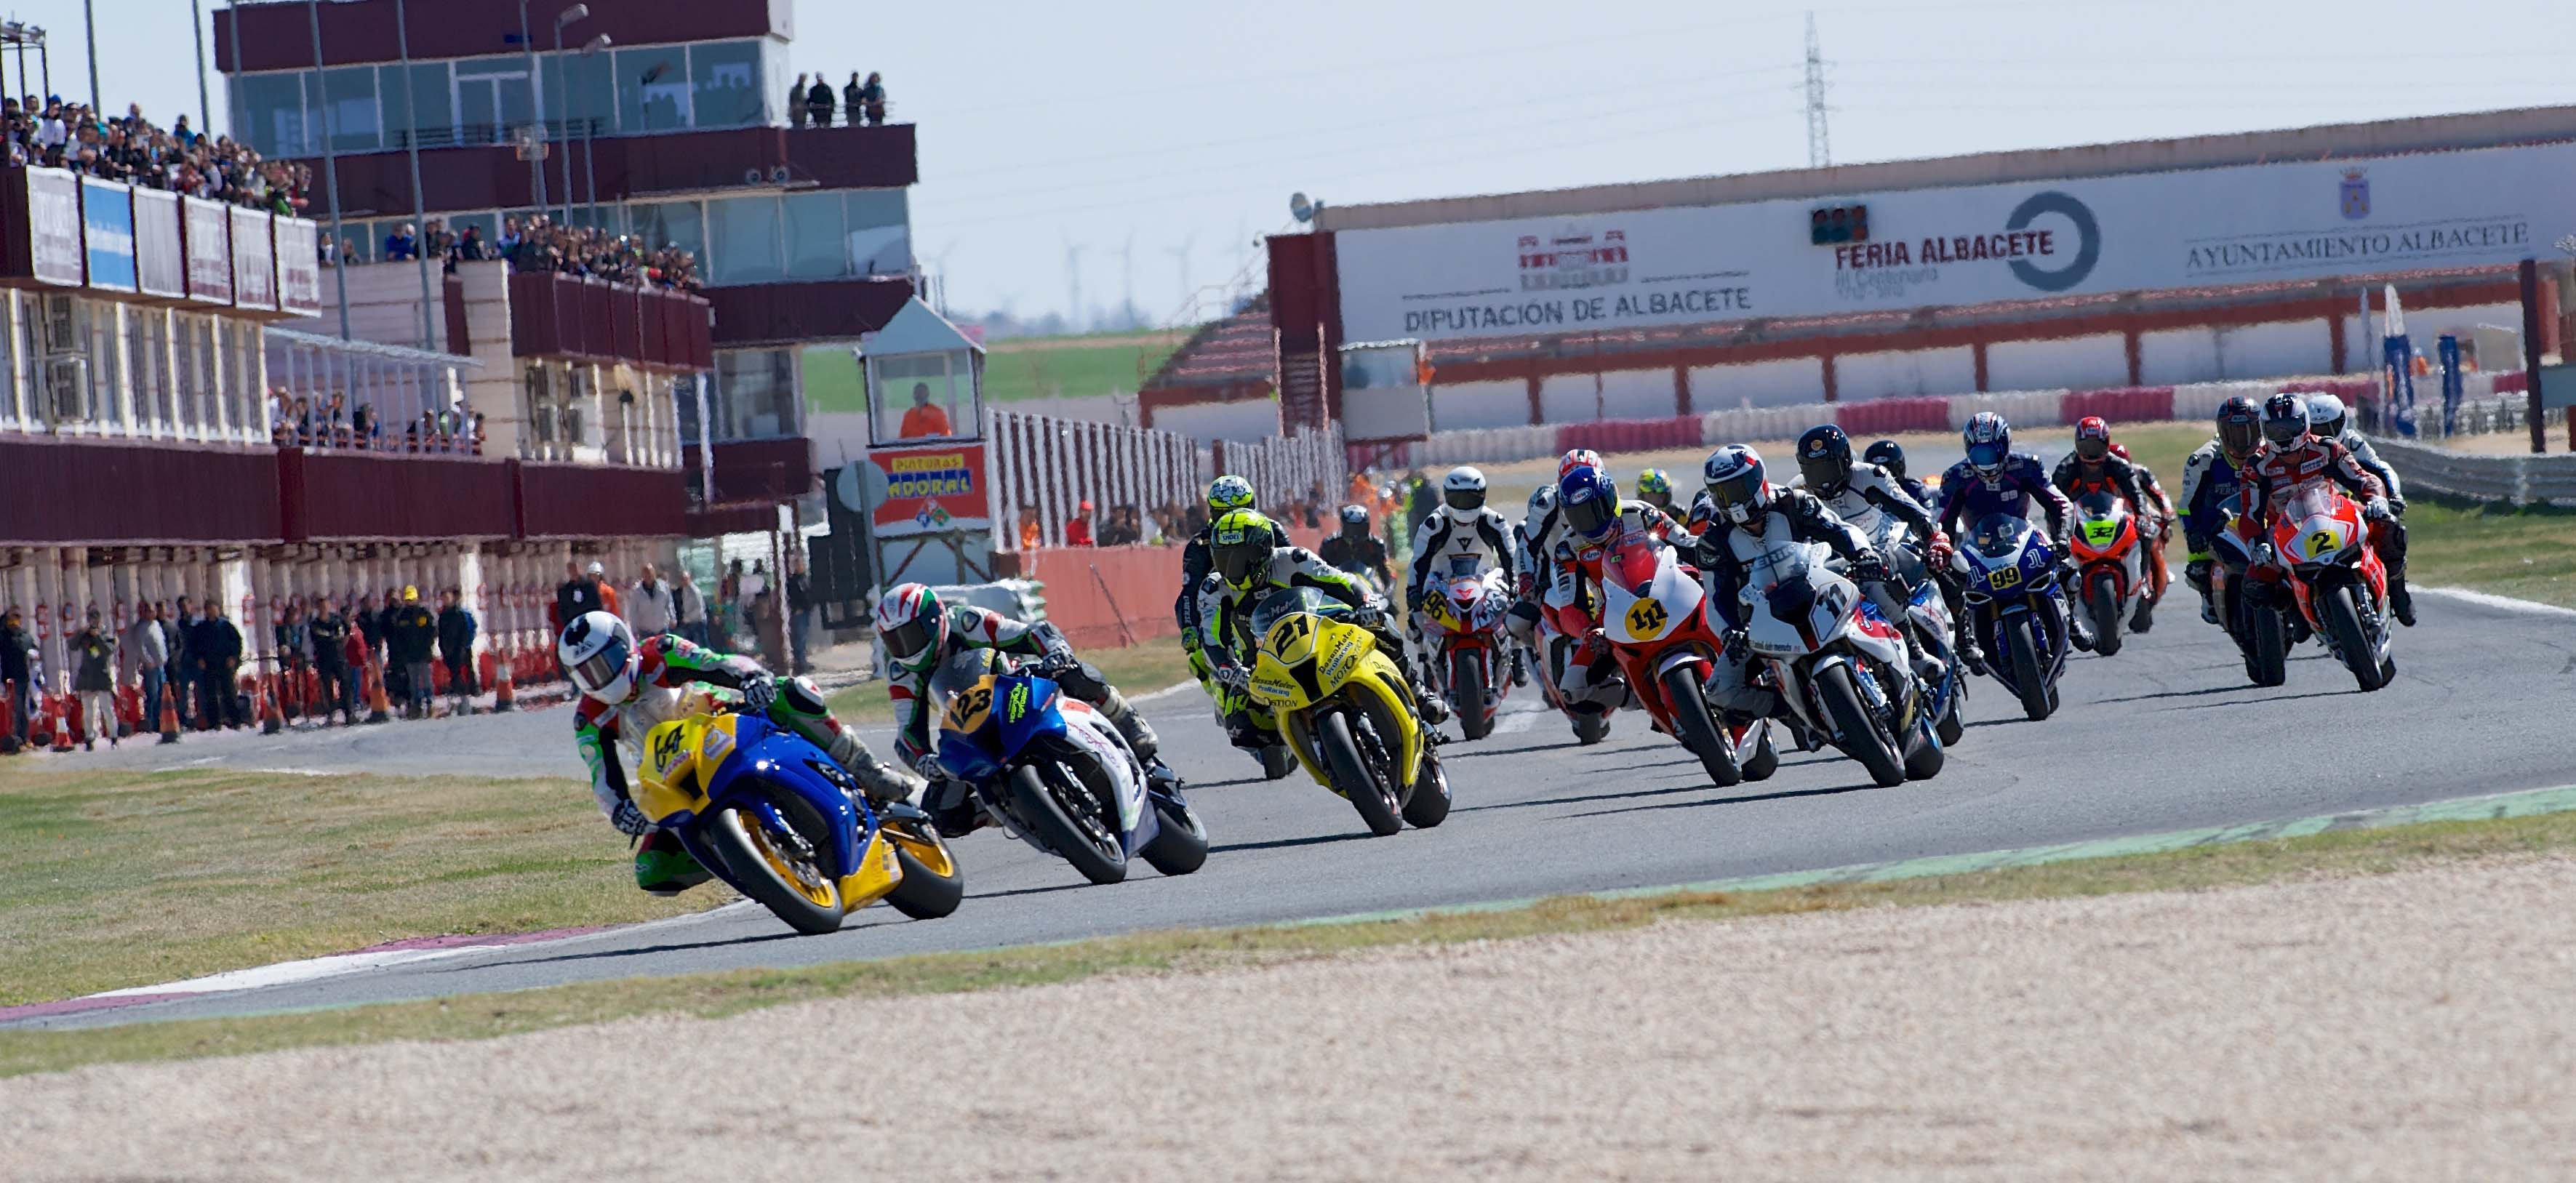 Regional de Motociclismo (Foto: Circuito de Albacete)